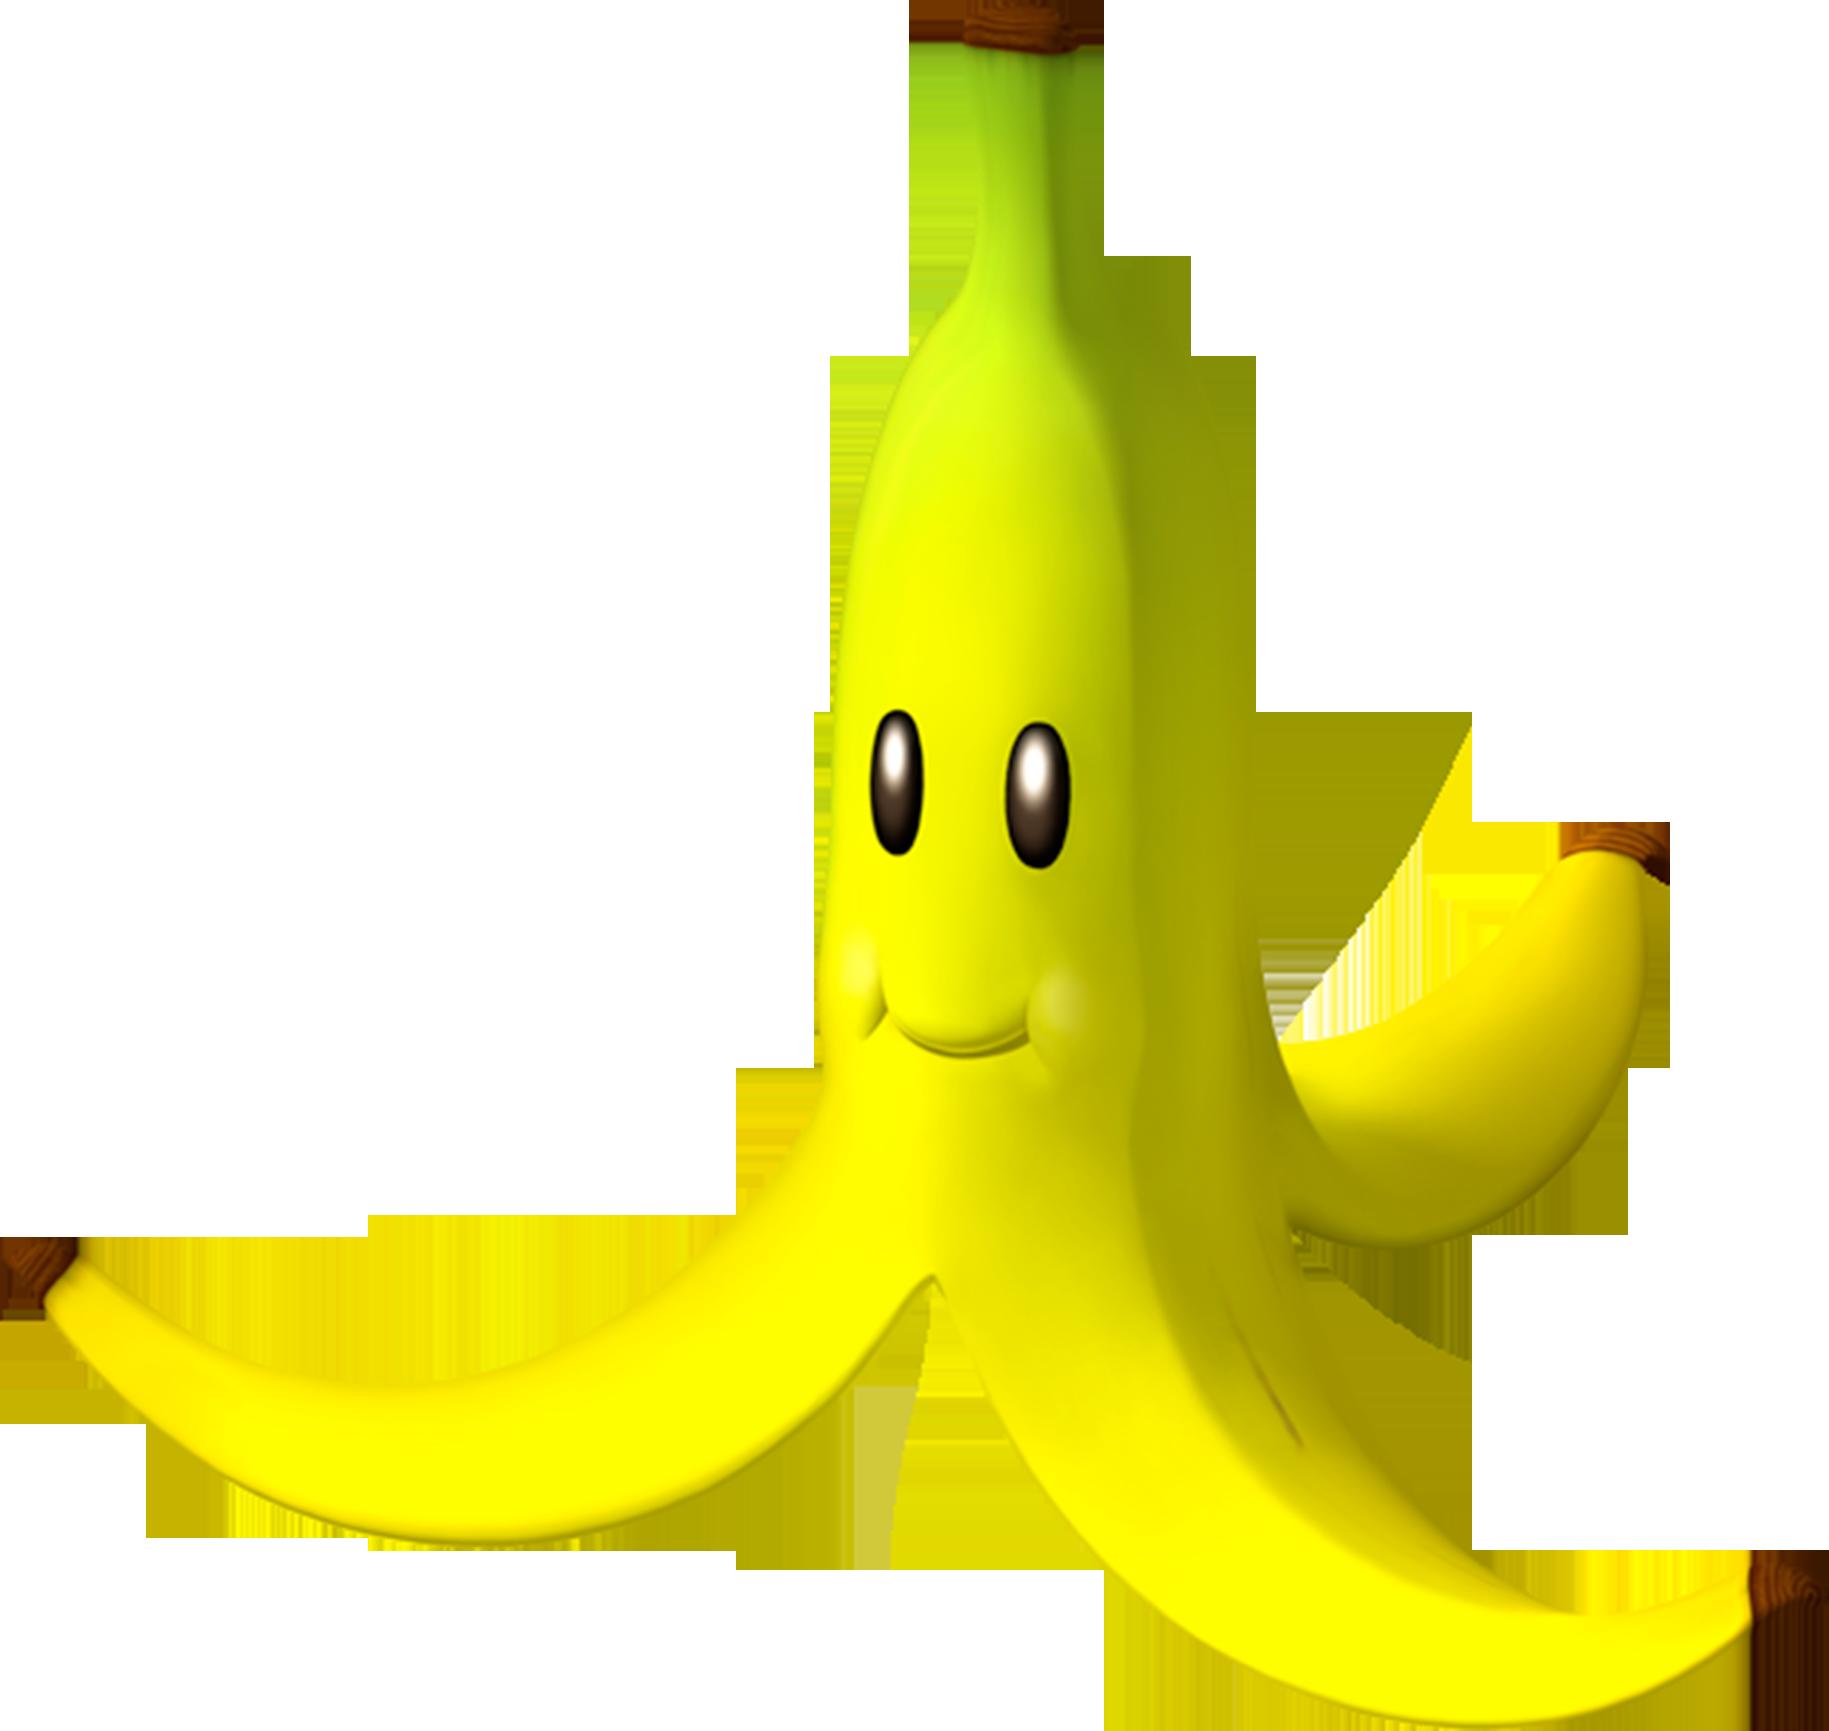 Banana peel transparent - photo#12